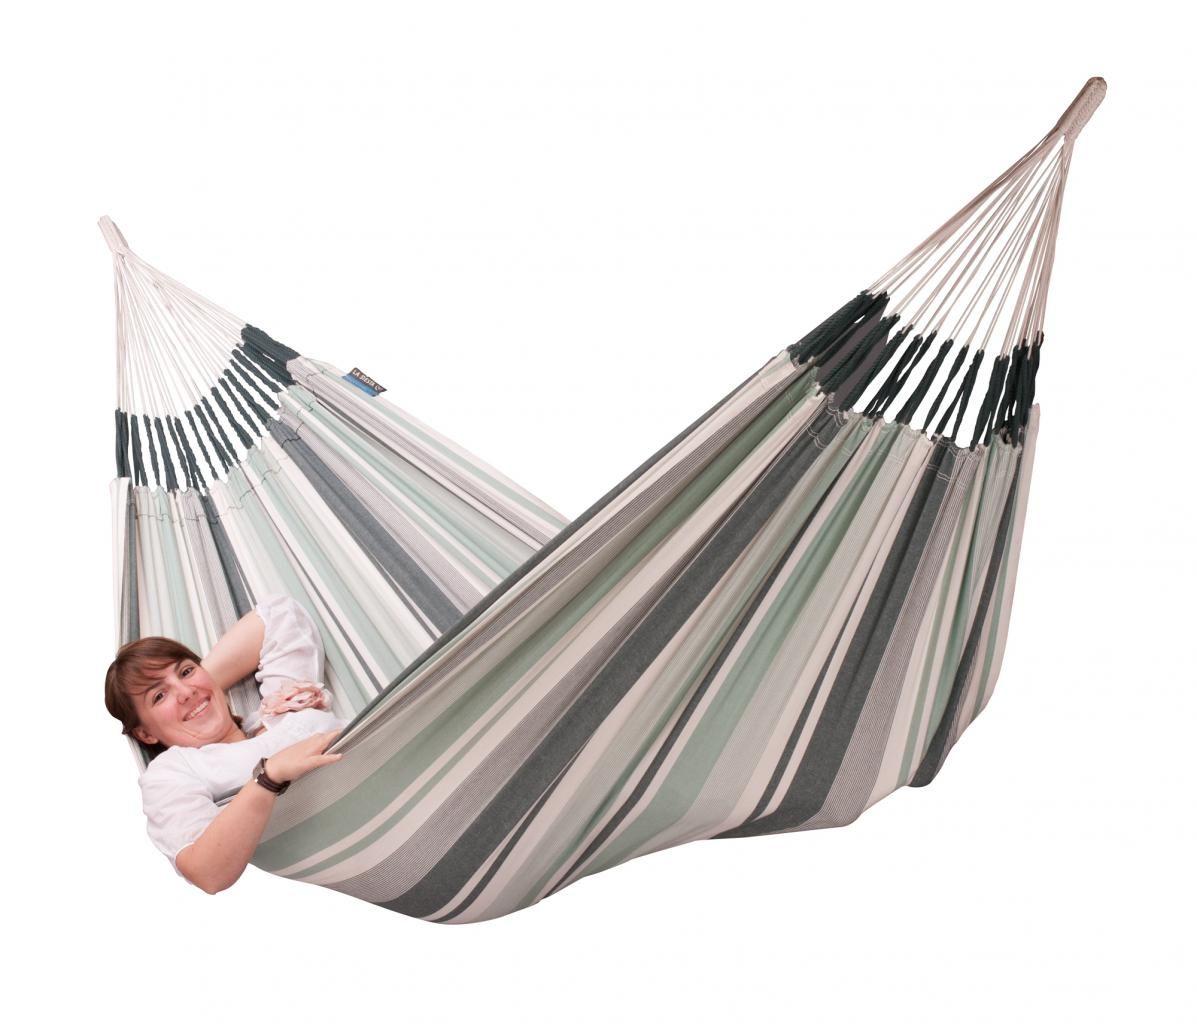 Paloma Olive Tweepersoons Hangmat Hoog Hangmatten